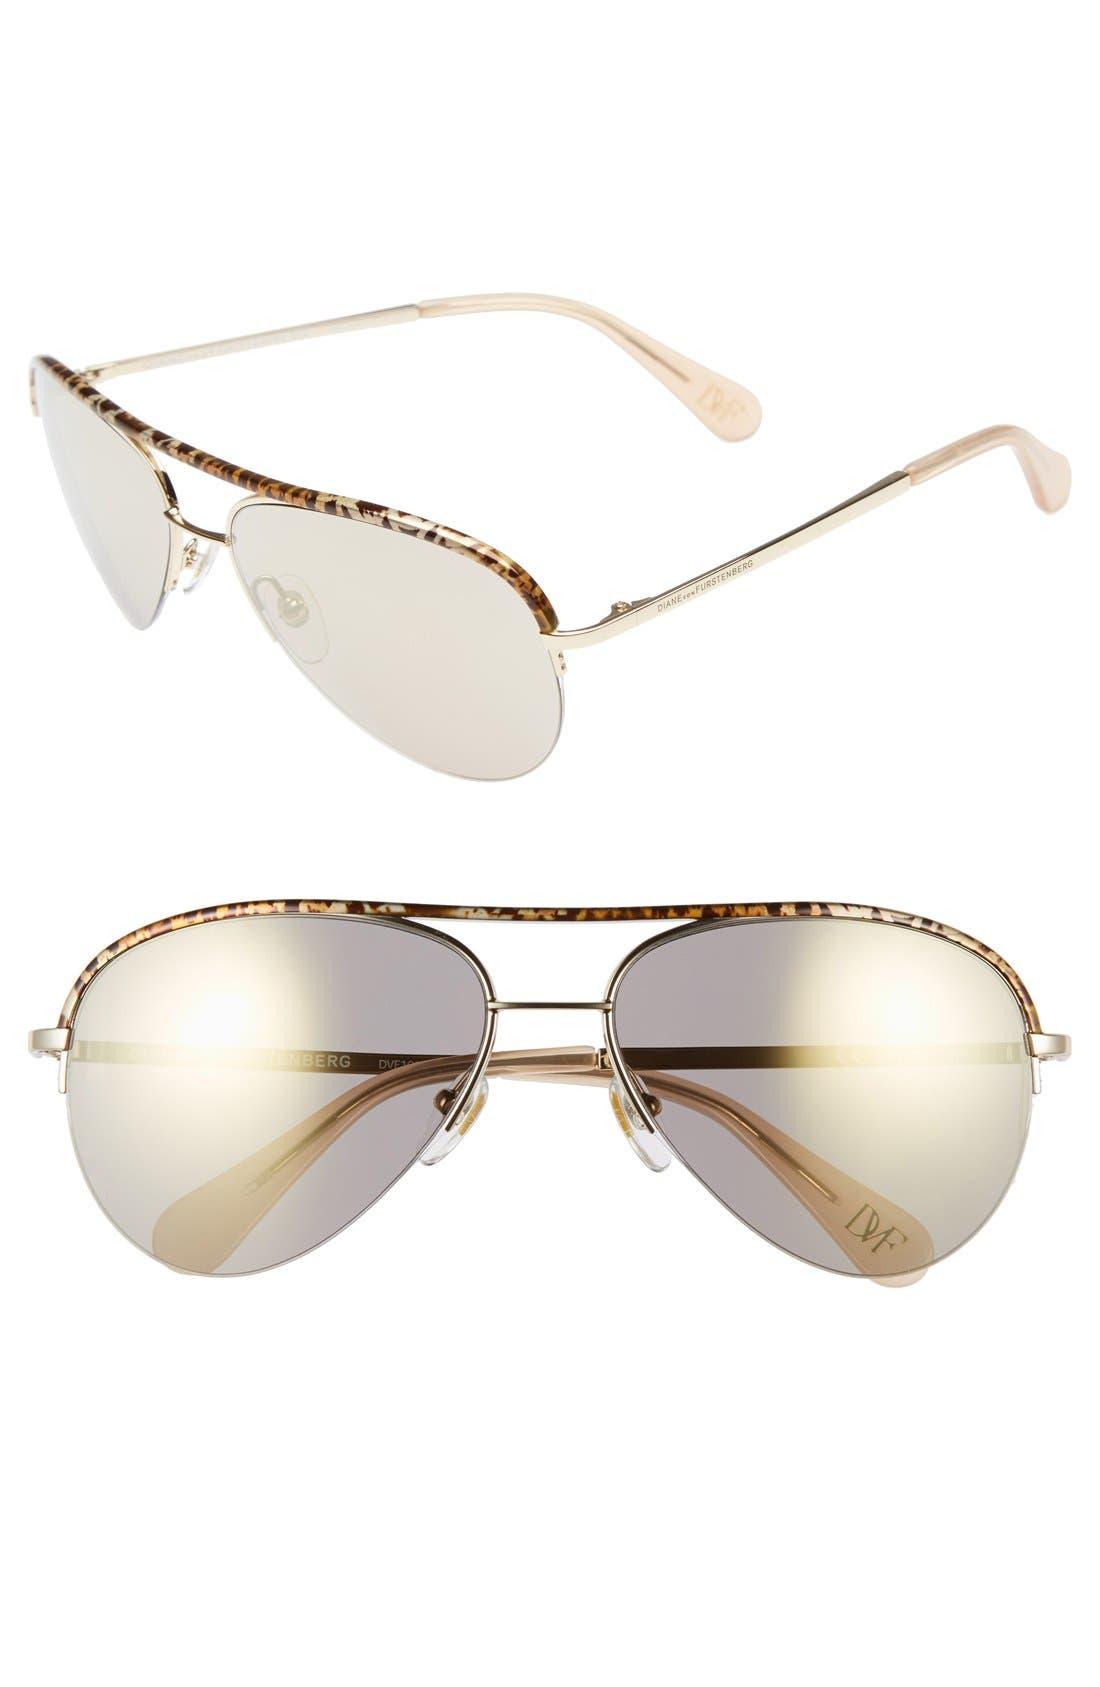 Alternate Image 1 Selected - Diane von Furstenberg 'Farrah' 58mm Aviator Sunglasses